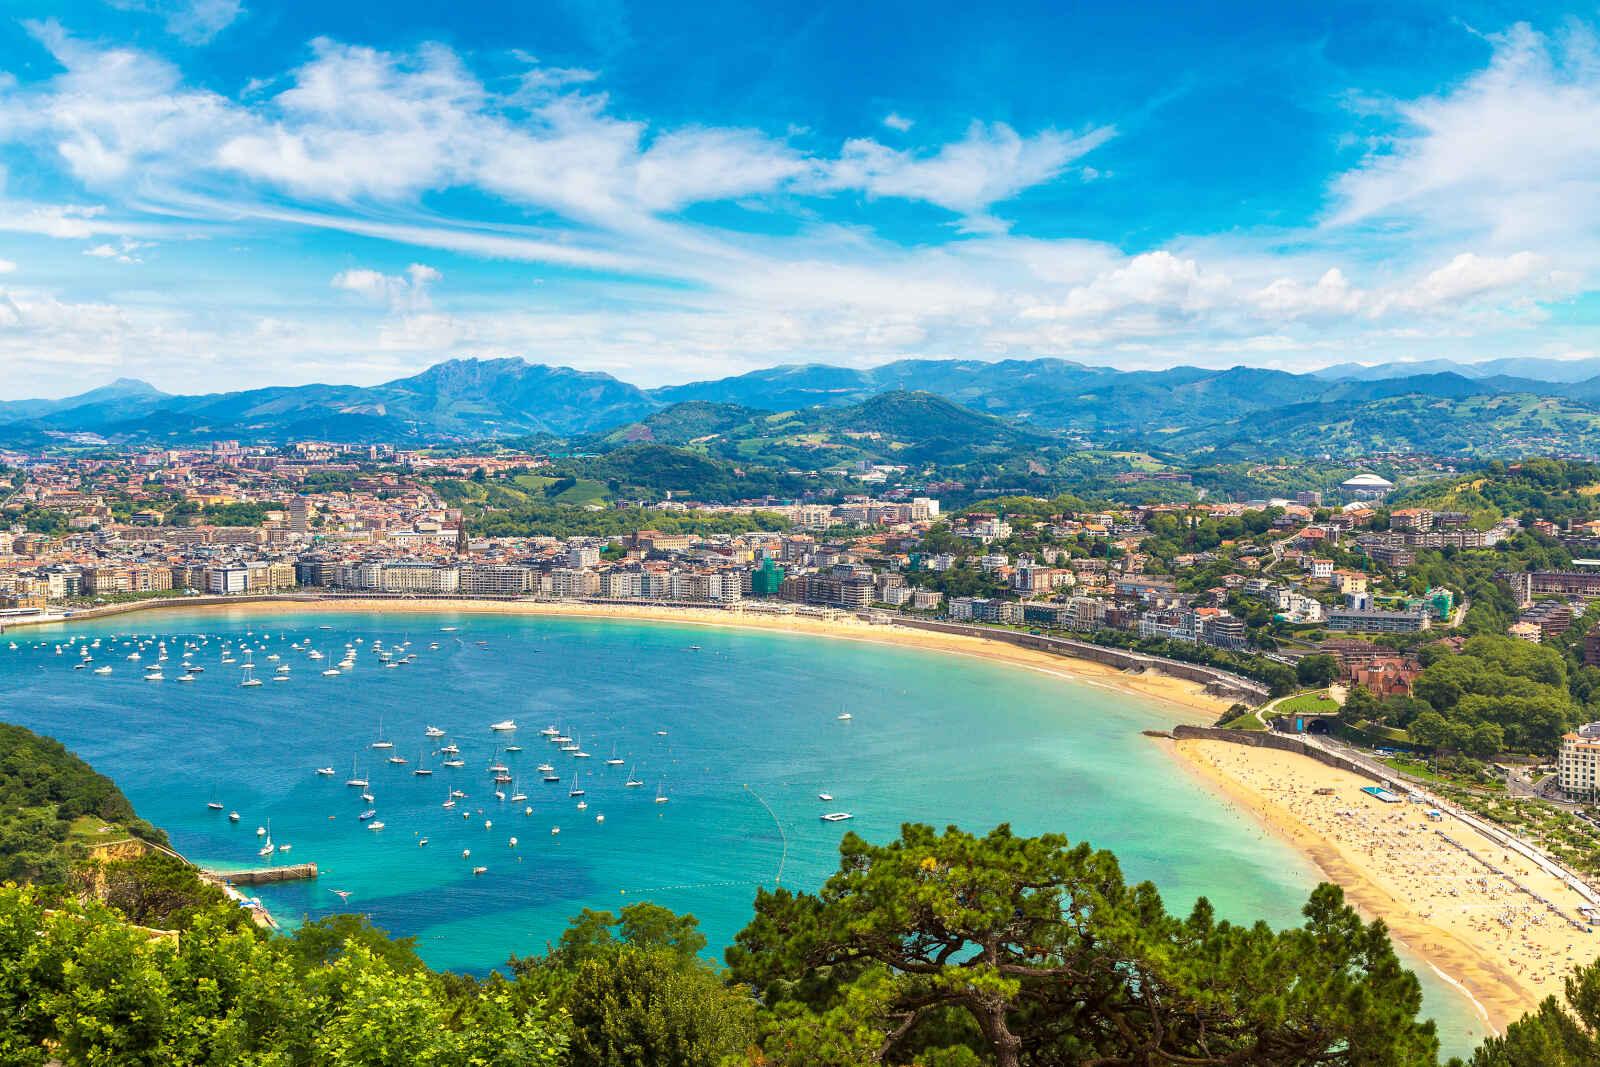 Espagne : Du pays basque espagnol au Portugal